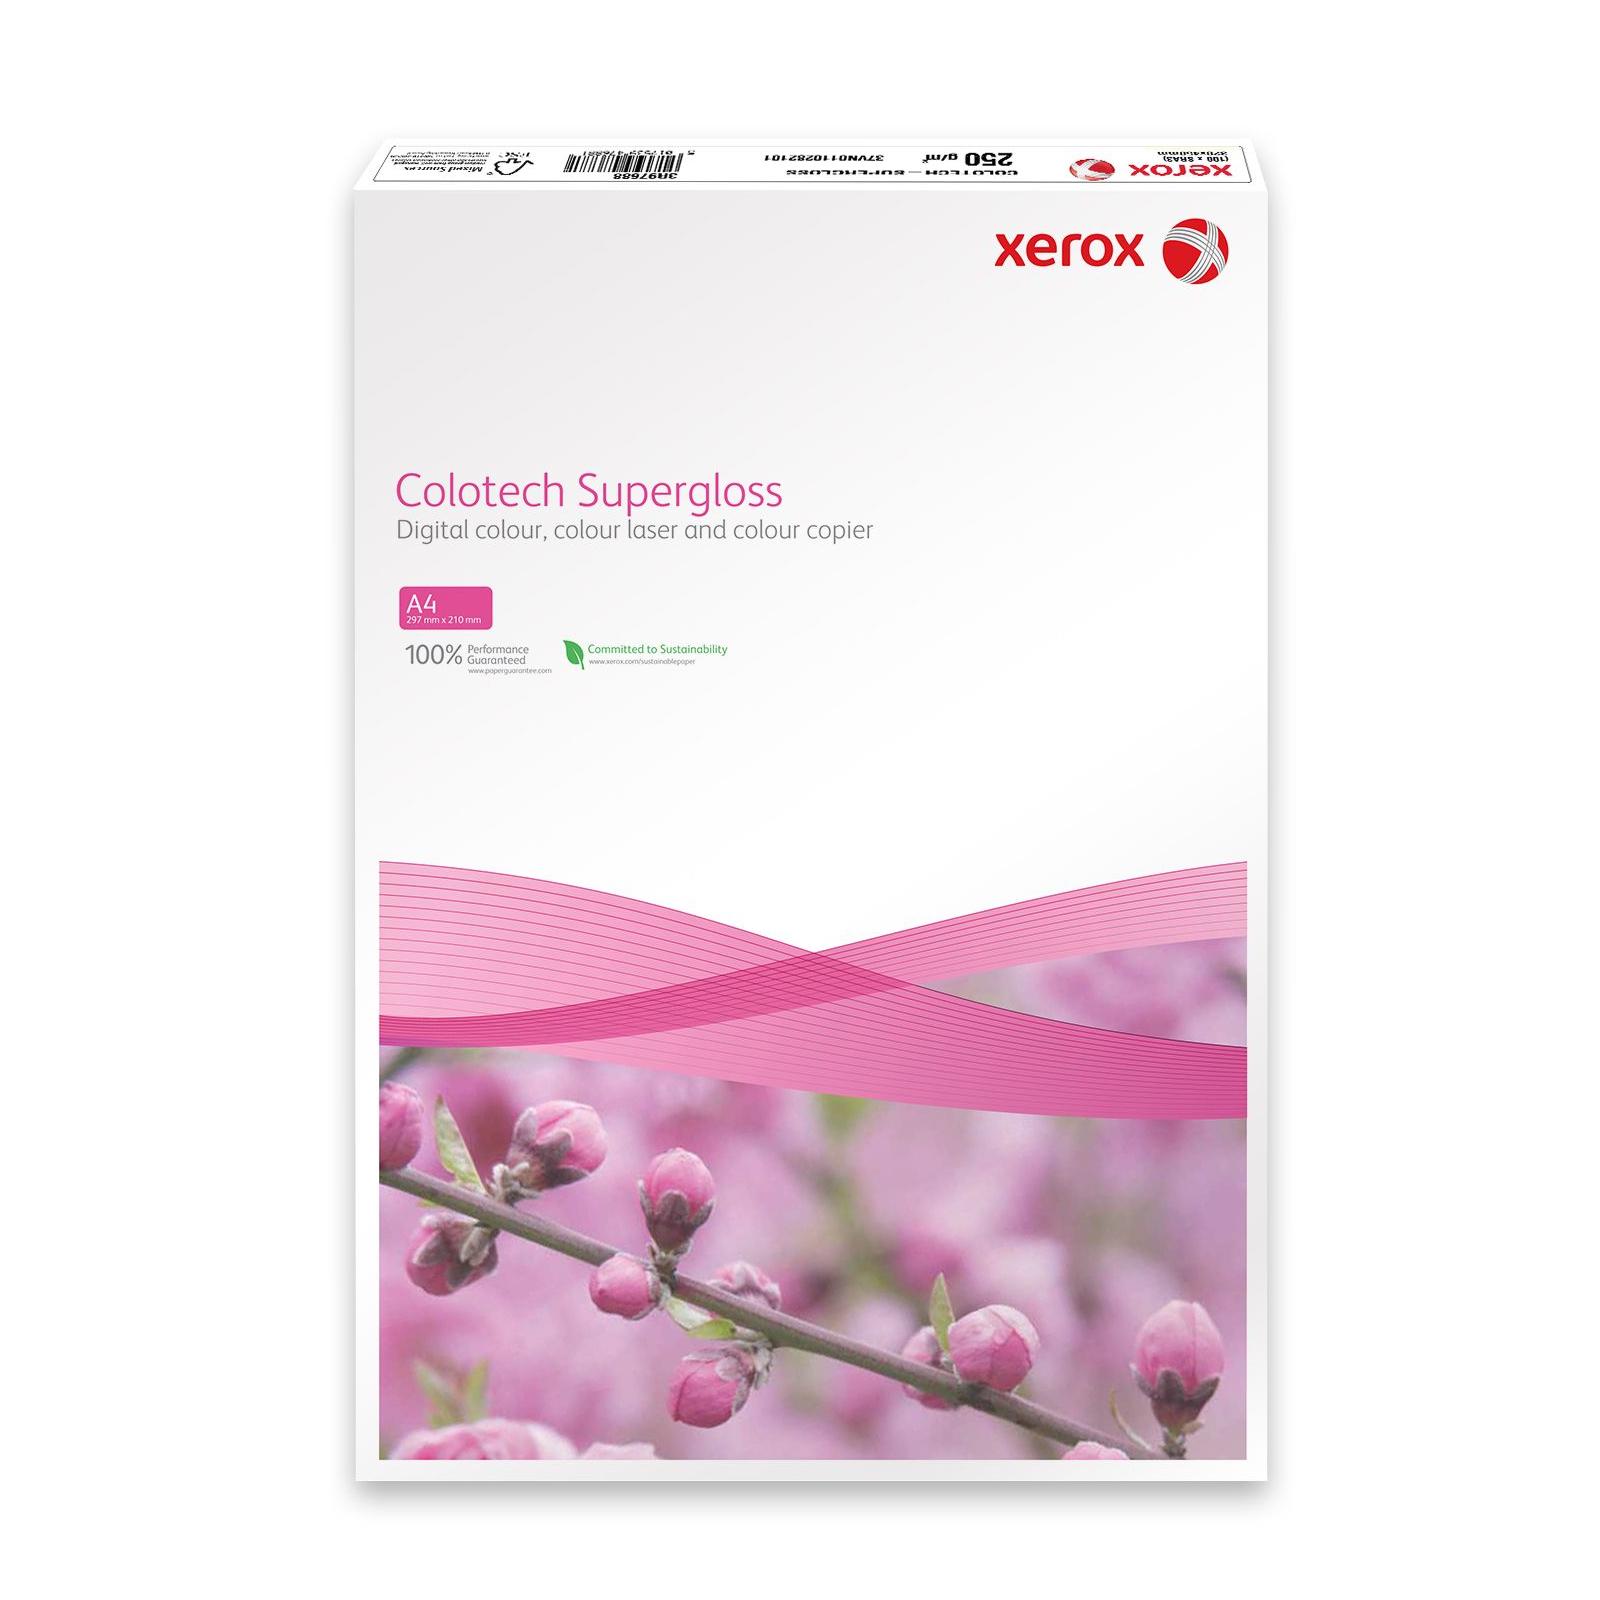 Бумага XEROX A3 COLOTECH + SUPERGLOSS (003R97681)